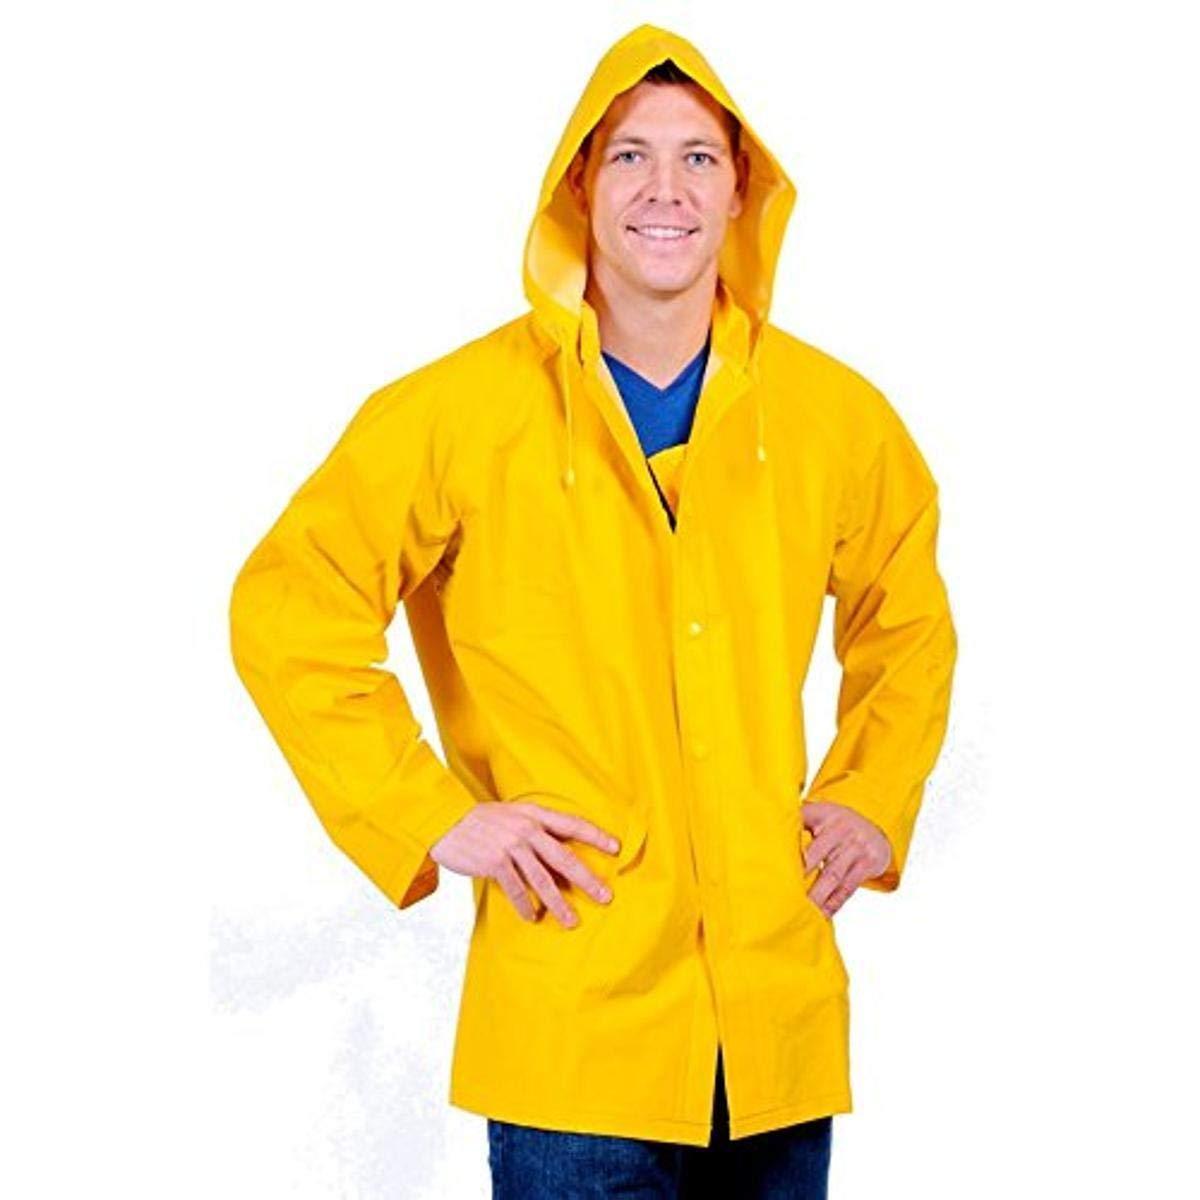 Galeton 7960-XL-YW Repel Rainwear 0.35mm PVC/Polyester Rain Jacket with Detachable Hood, XL, Yellow